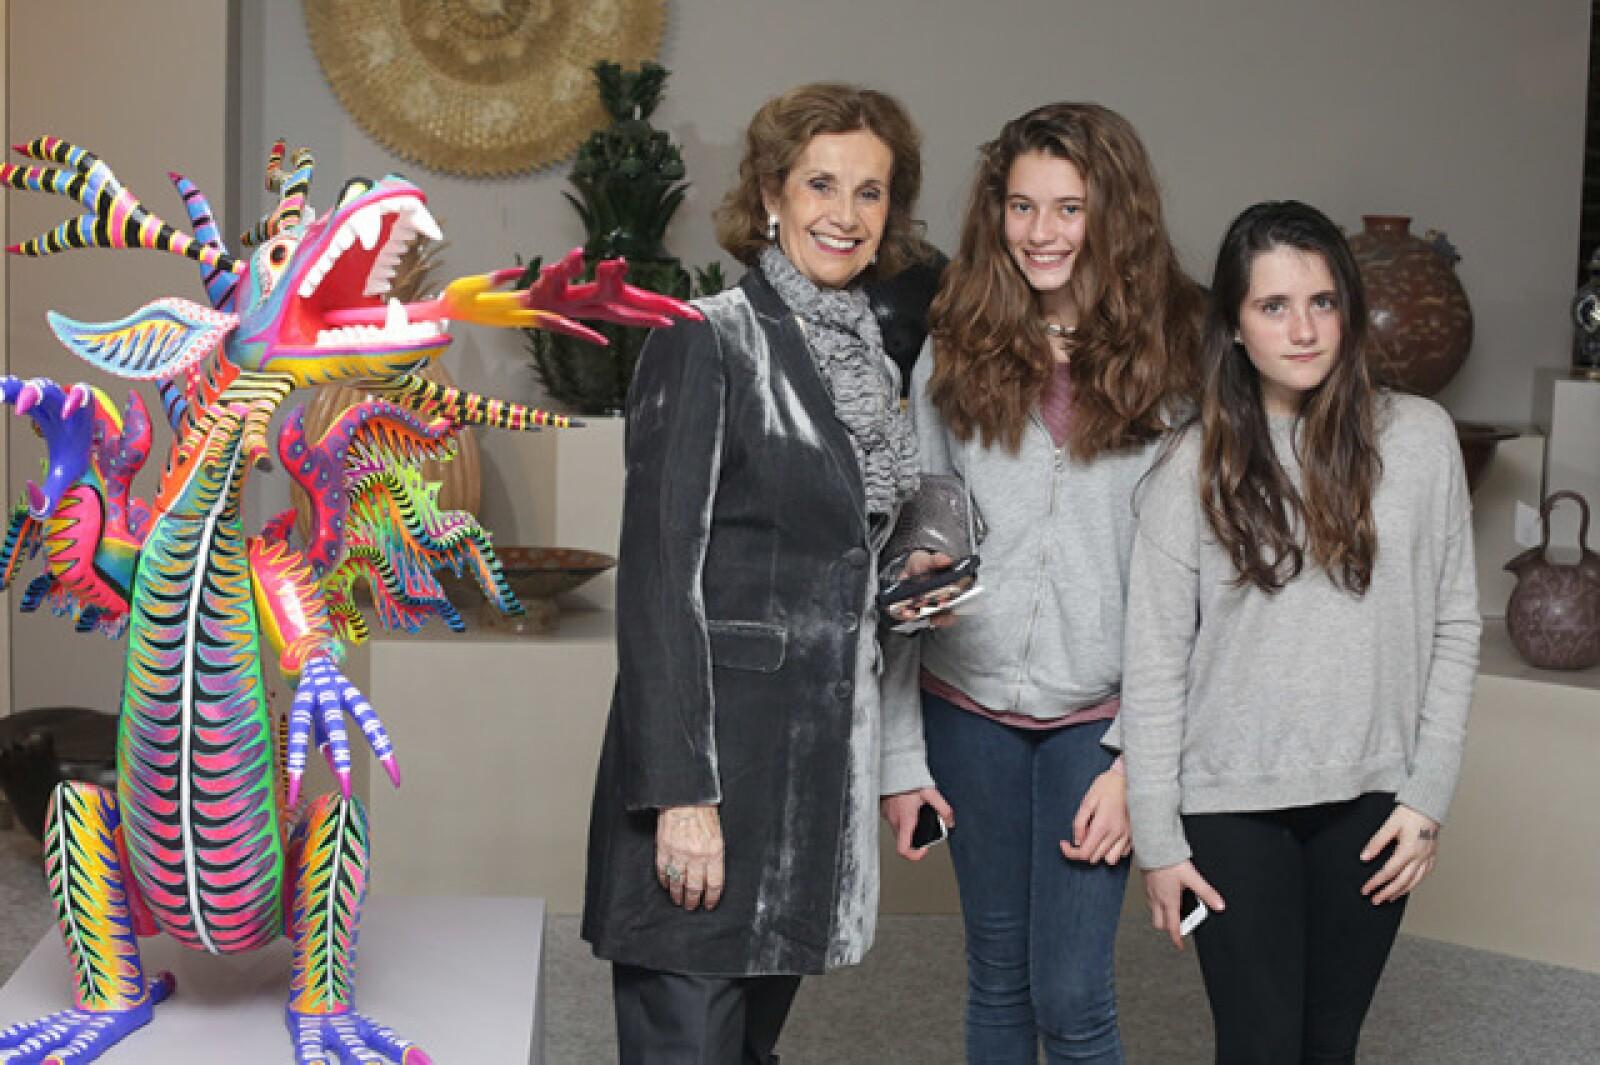 Natalia Loaeza de Lebretón,Inés Lebretón y Marina Livas